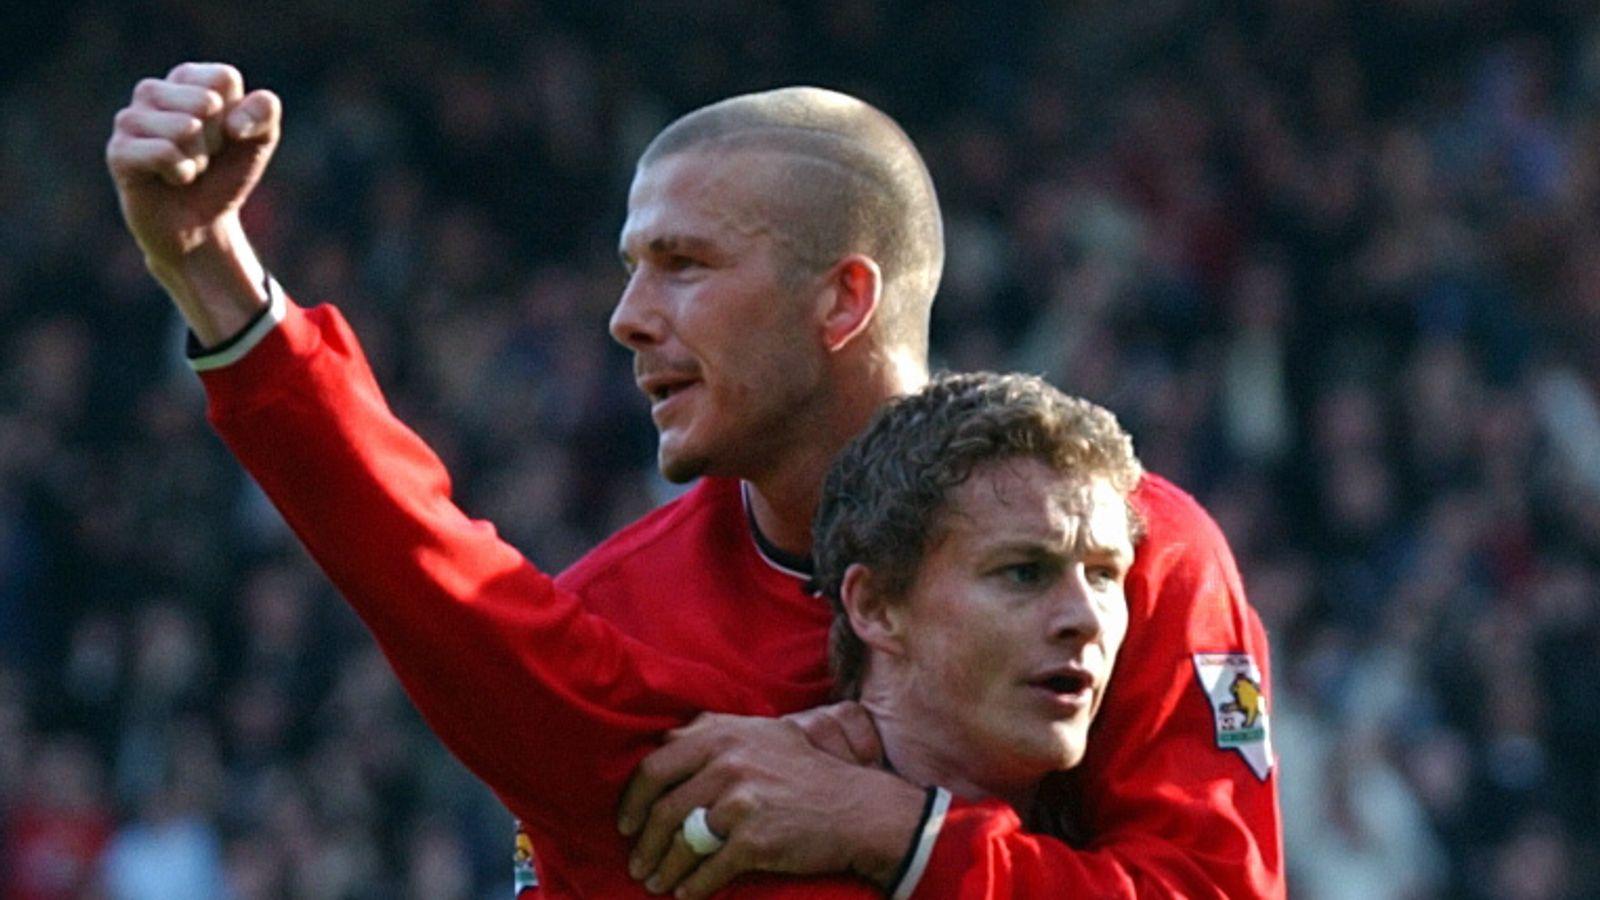 David Beckham: Ole Gunnar Solskjaer 'doing a good job' at Manchester United